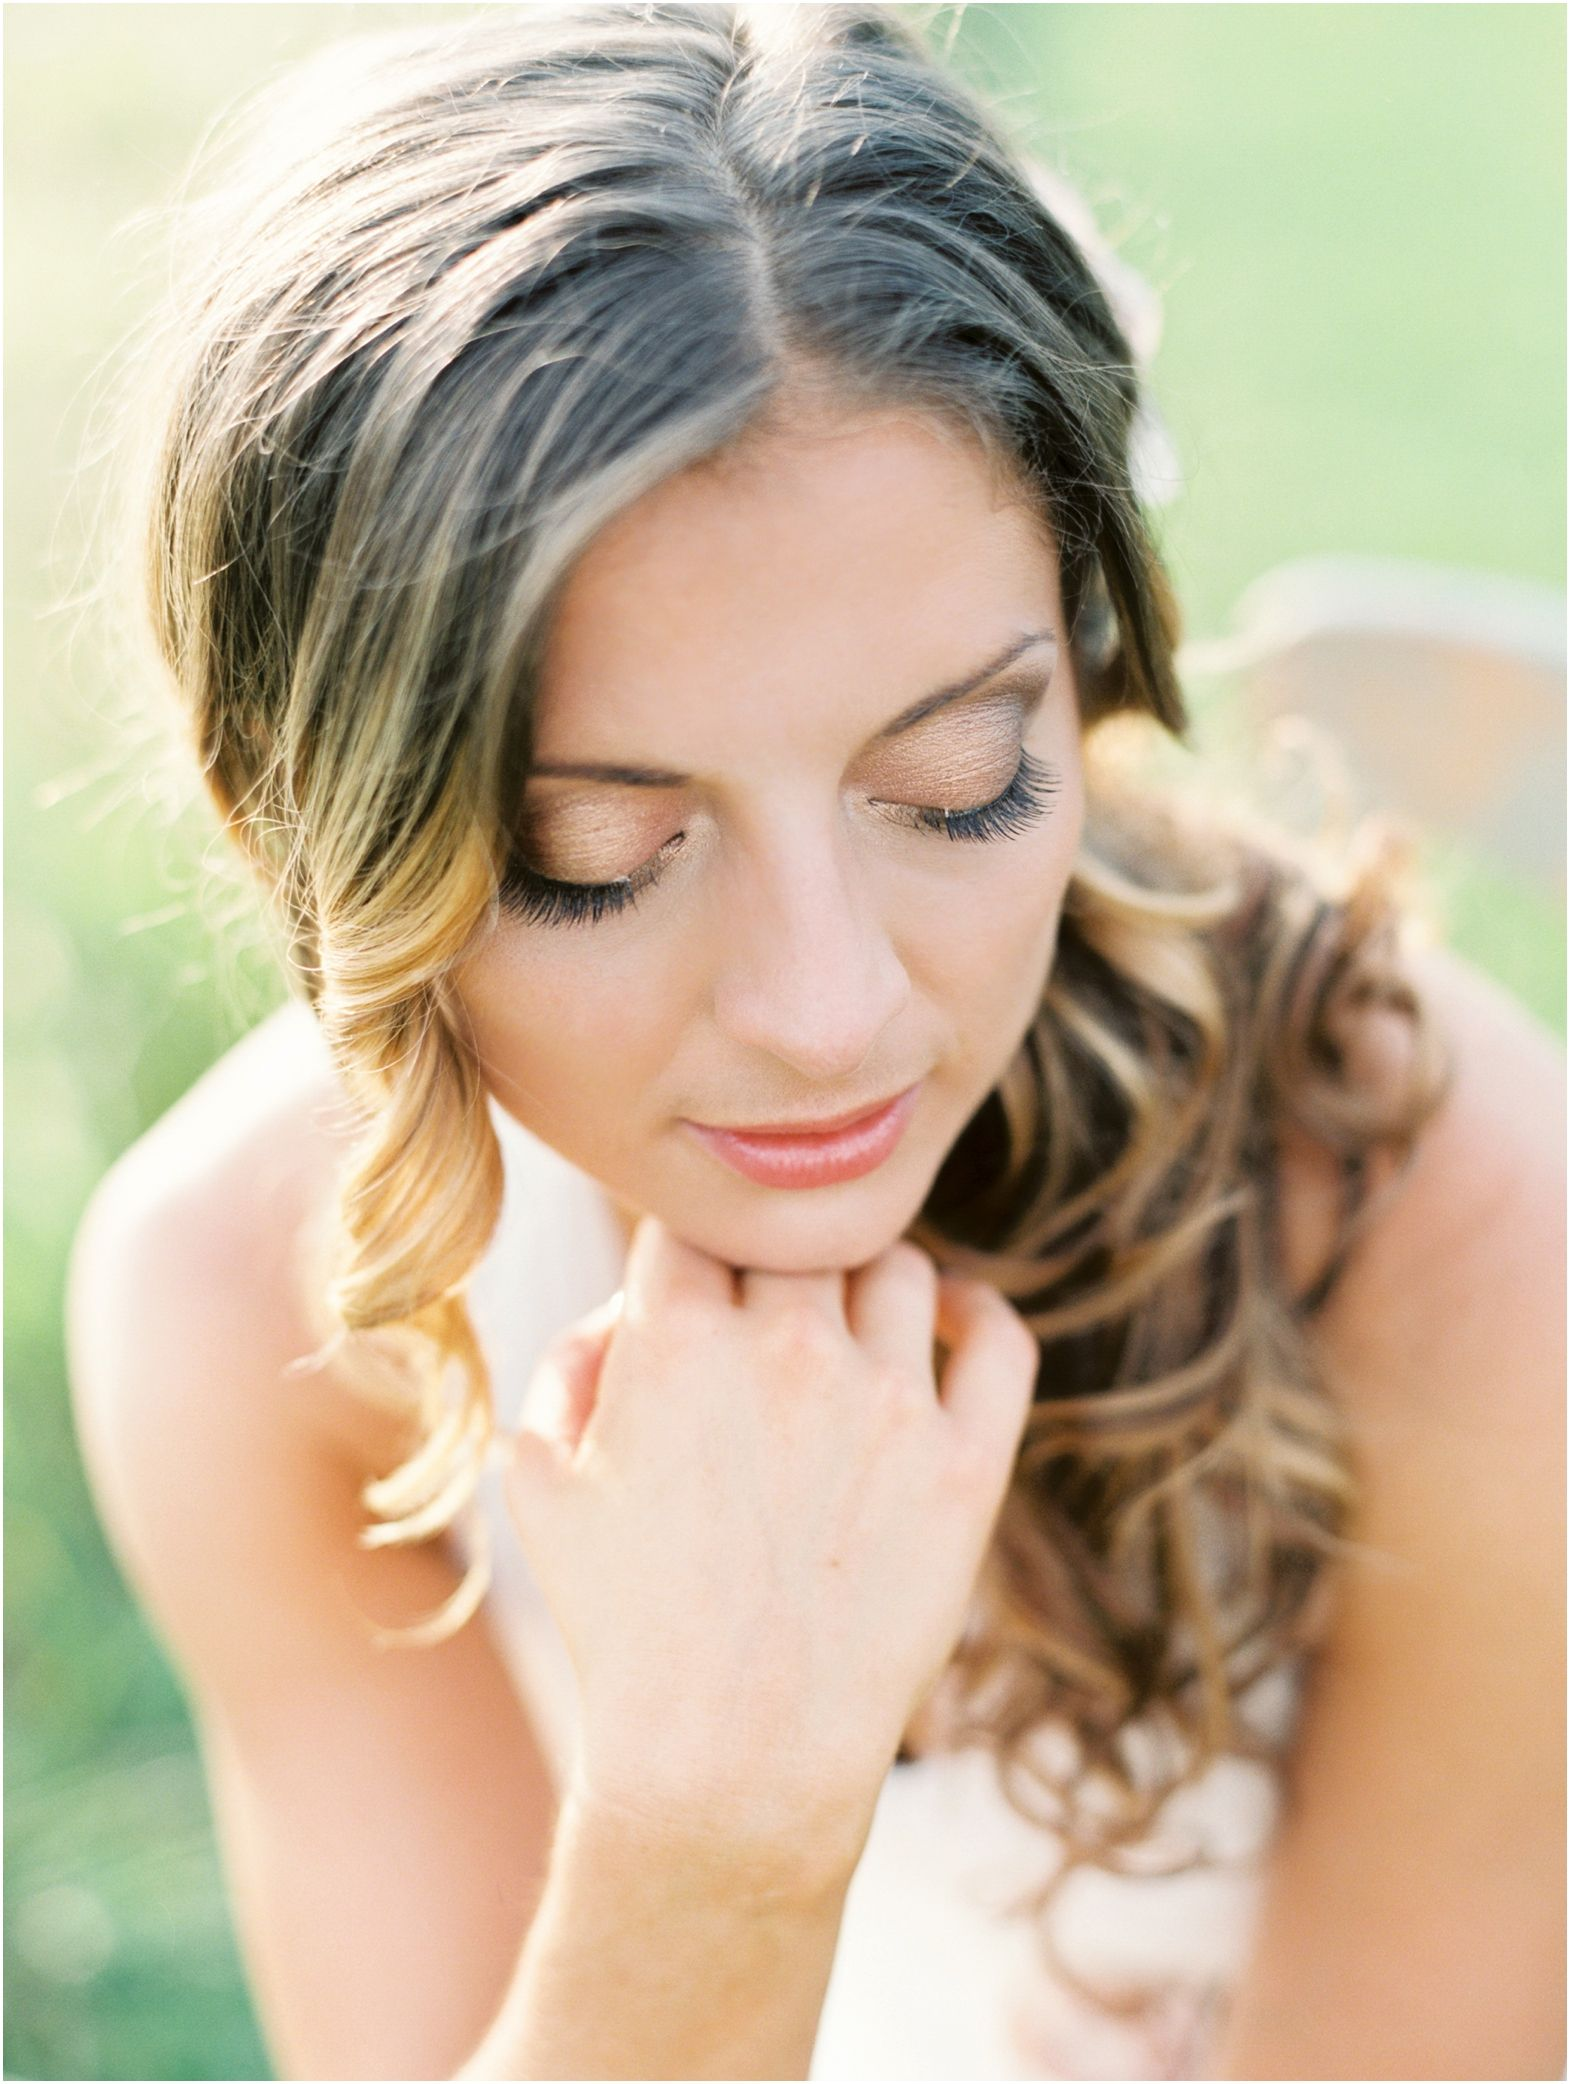 tony williams bridal makeup in knoxville tn | bridal makeup